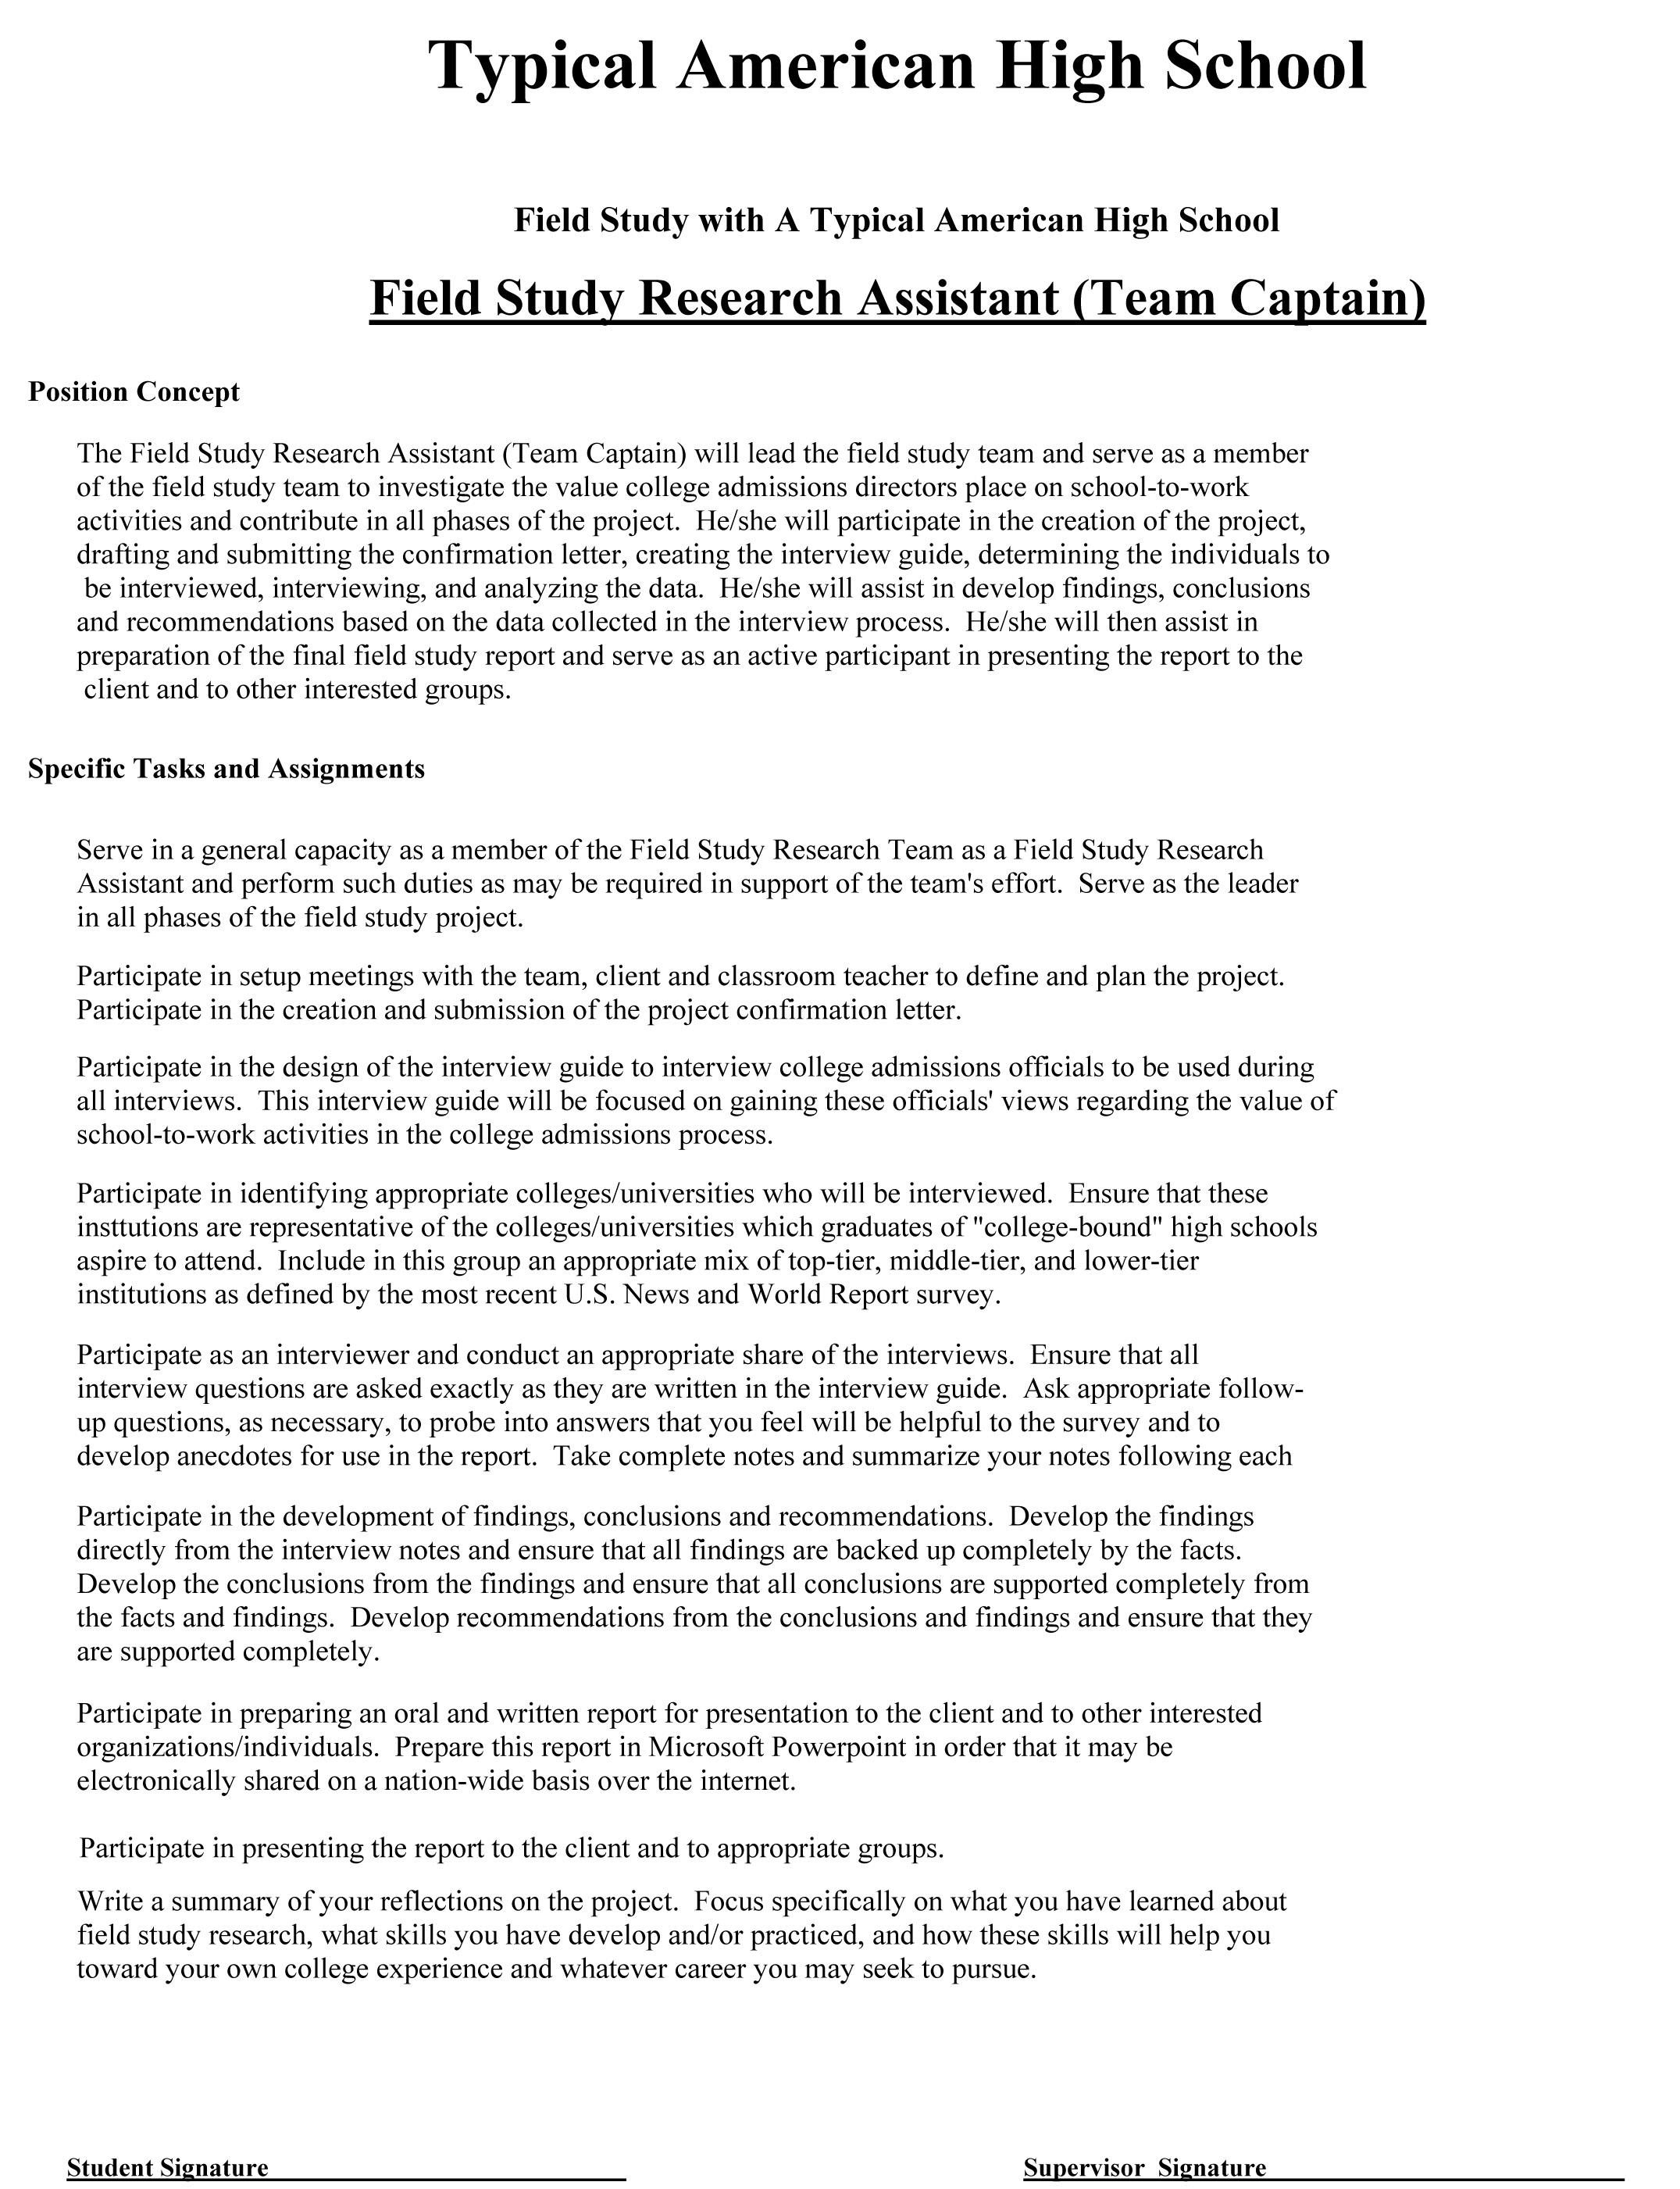 Field Studies – The BEST Way to Teach Critical Skills